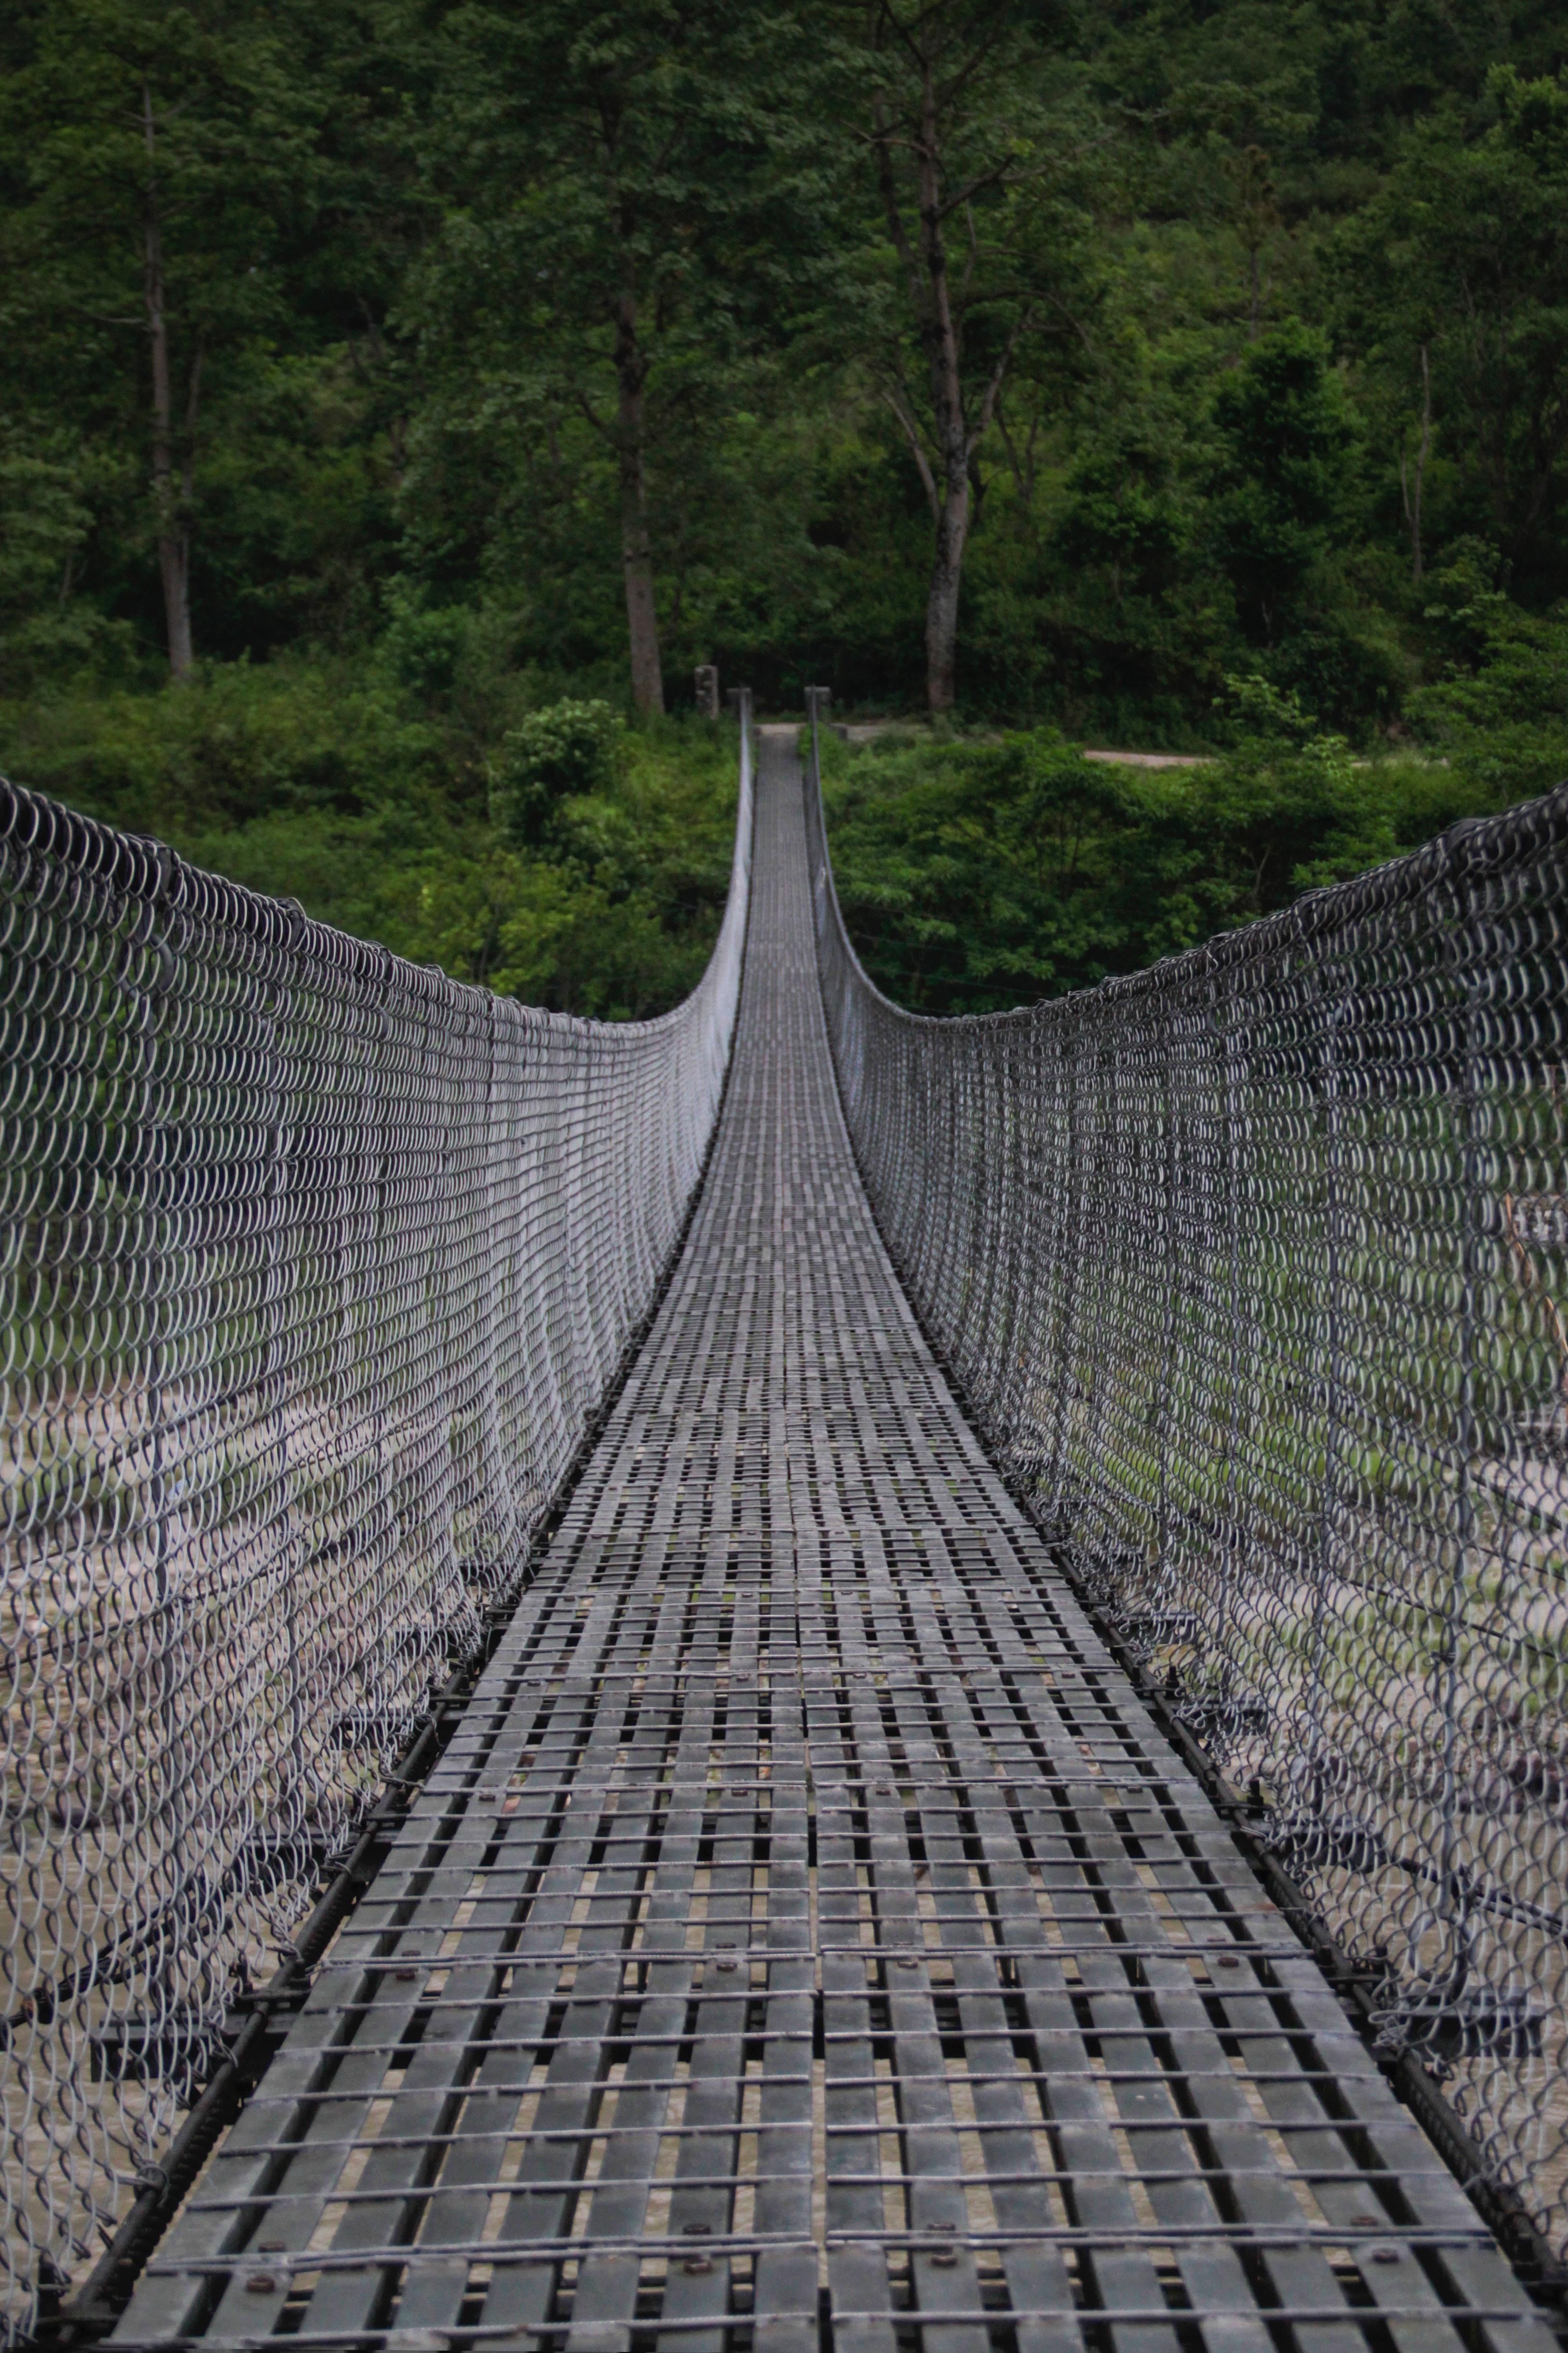 Close-up photography of a gray bridge